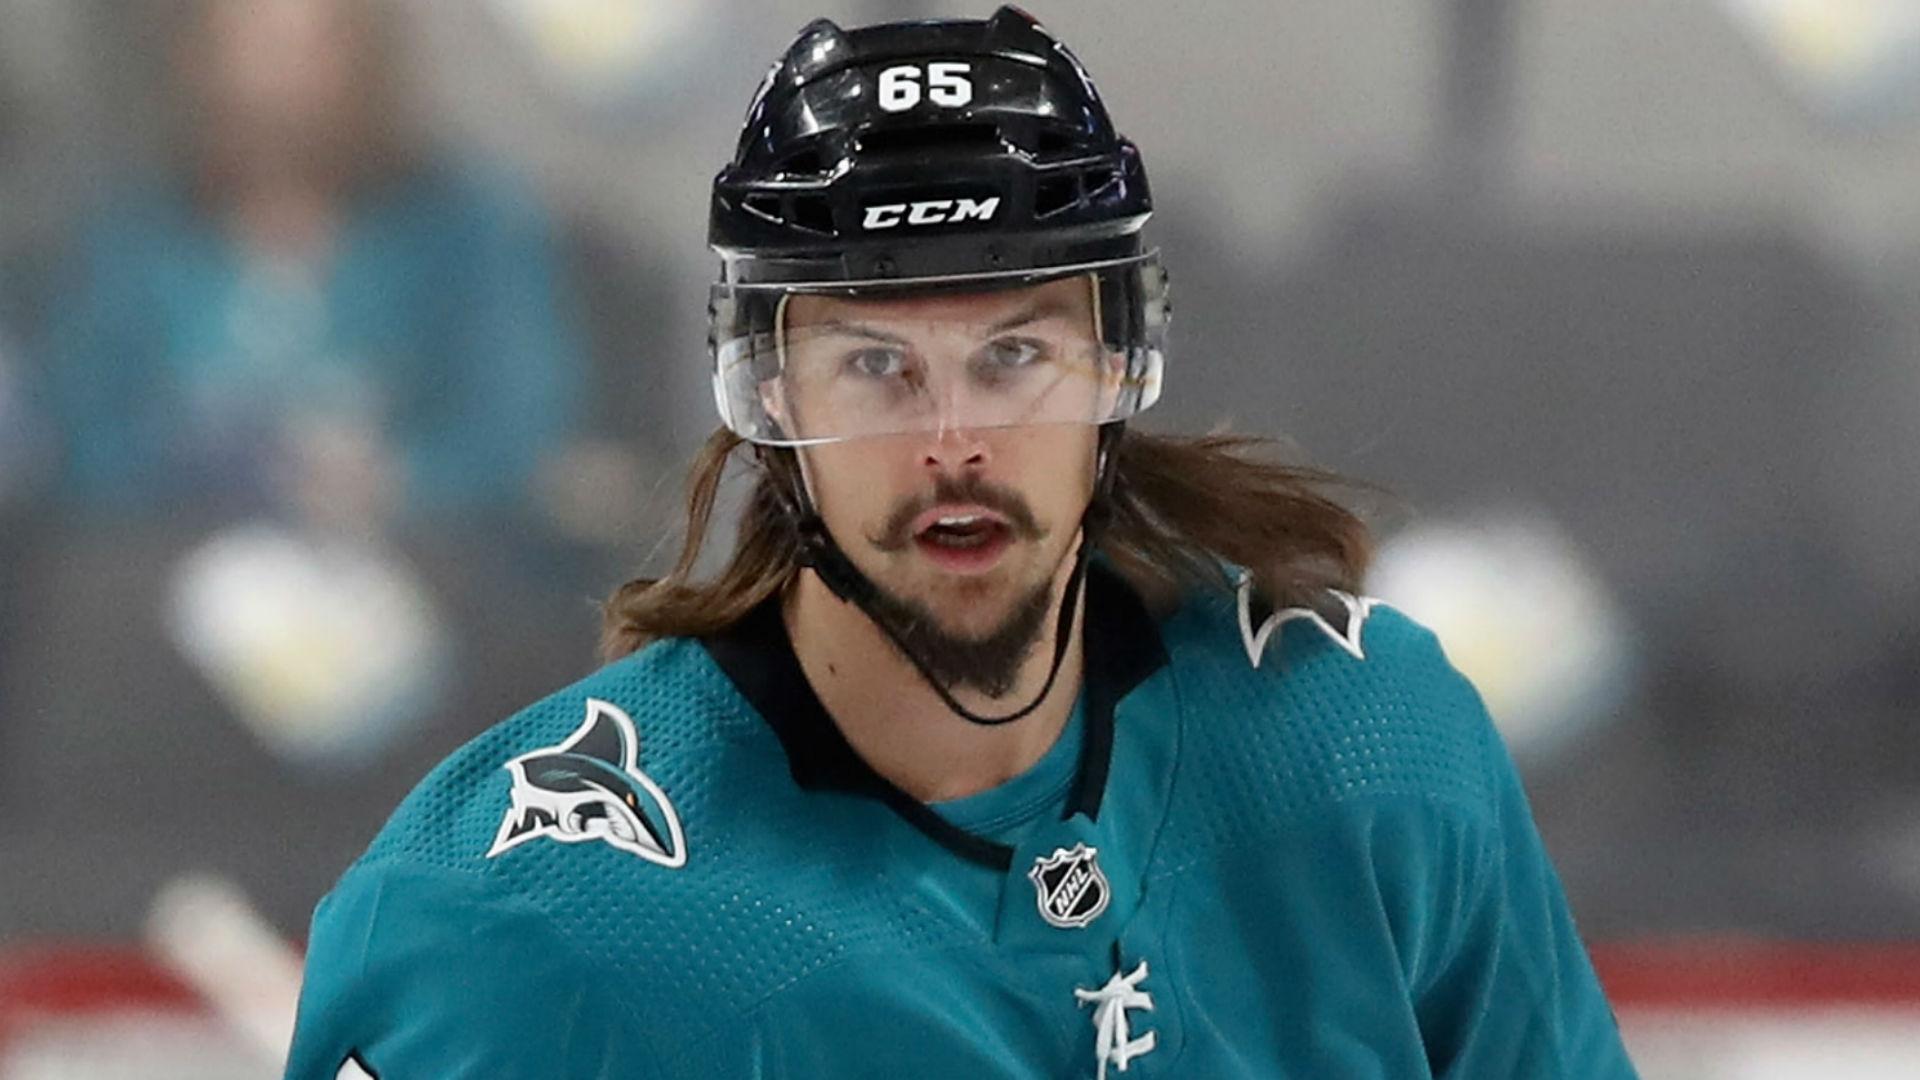 Sharks star Erik Karlsson to miss rest of season with broken thumb